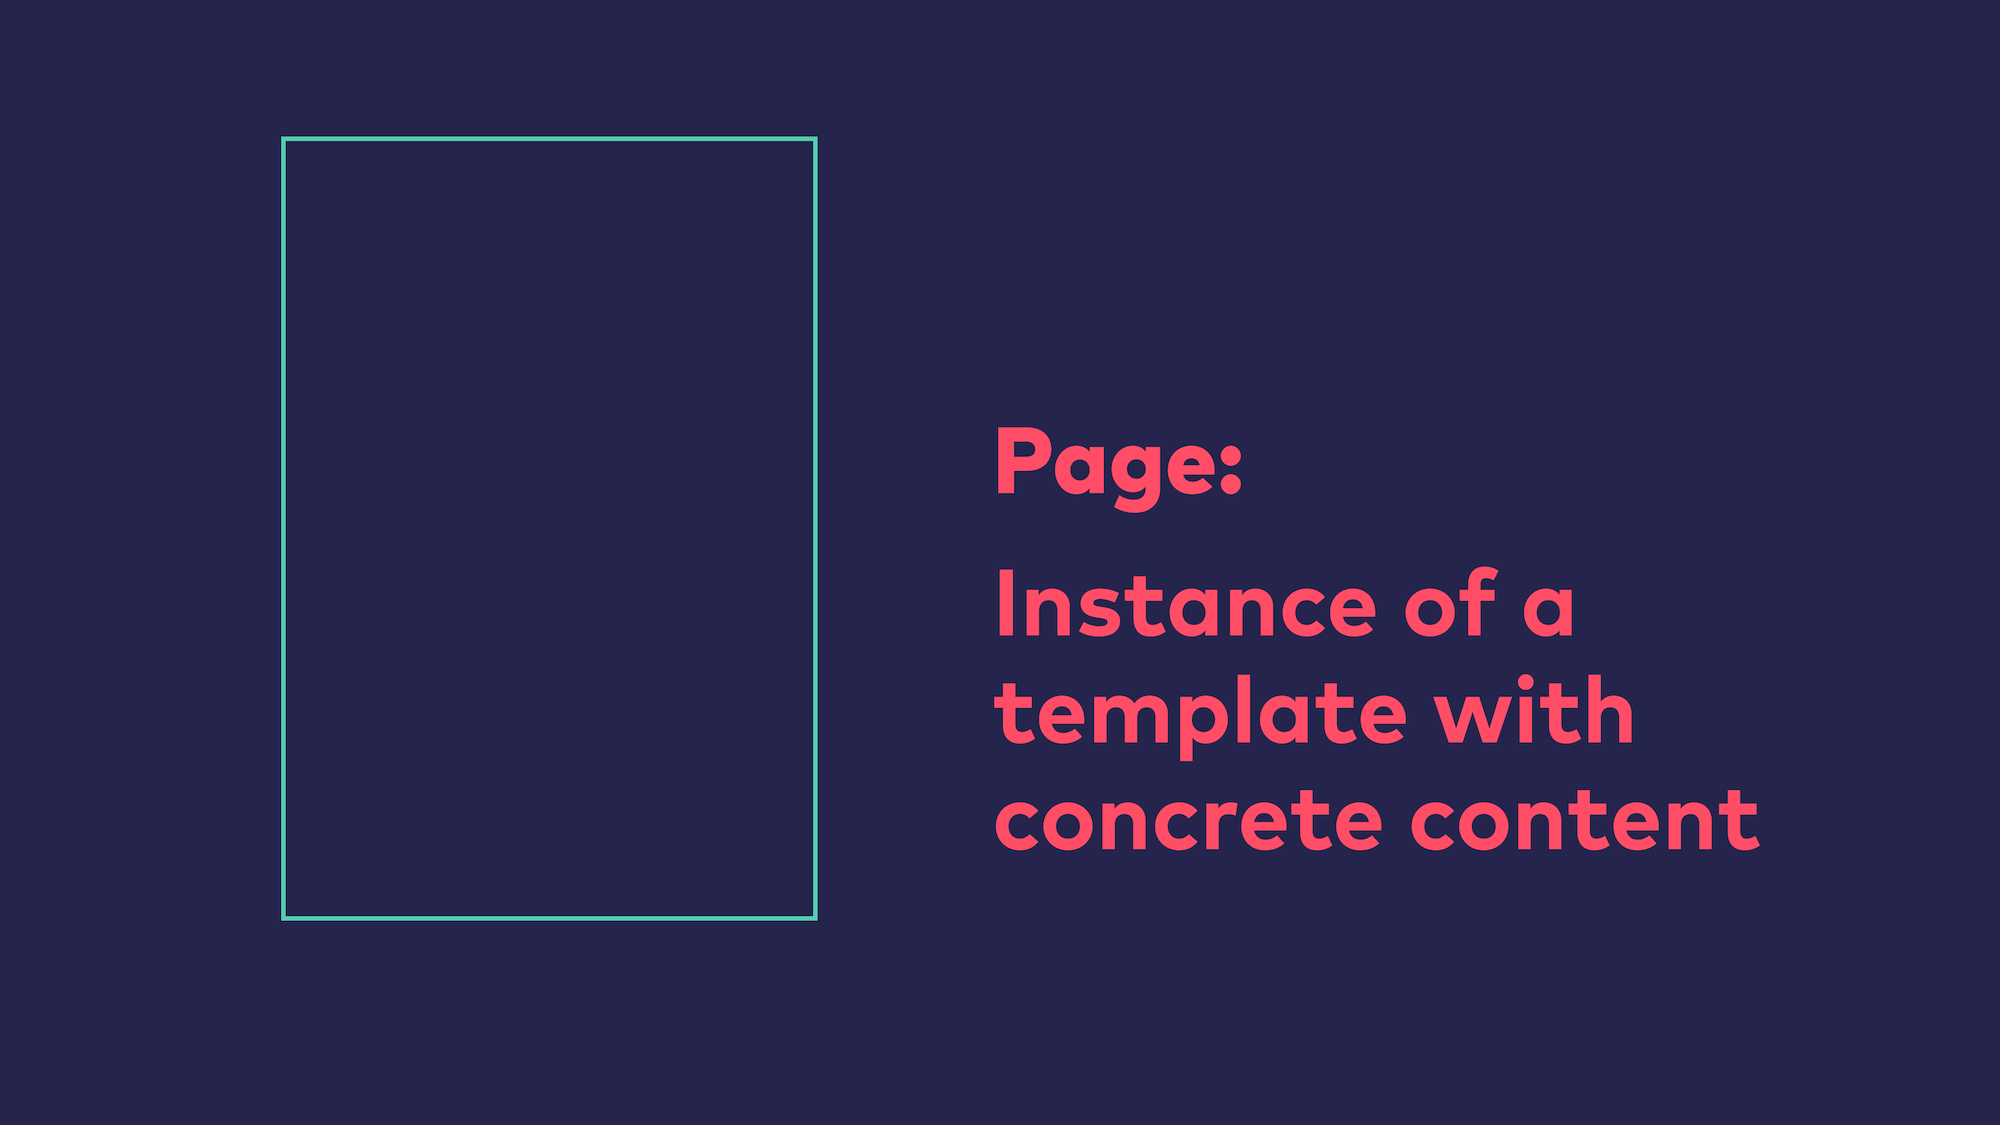 Abb. 13: Atomic Design - Page